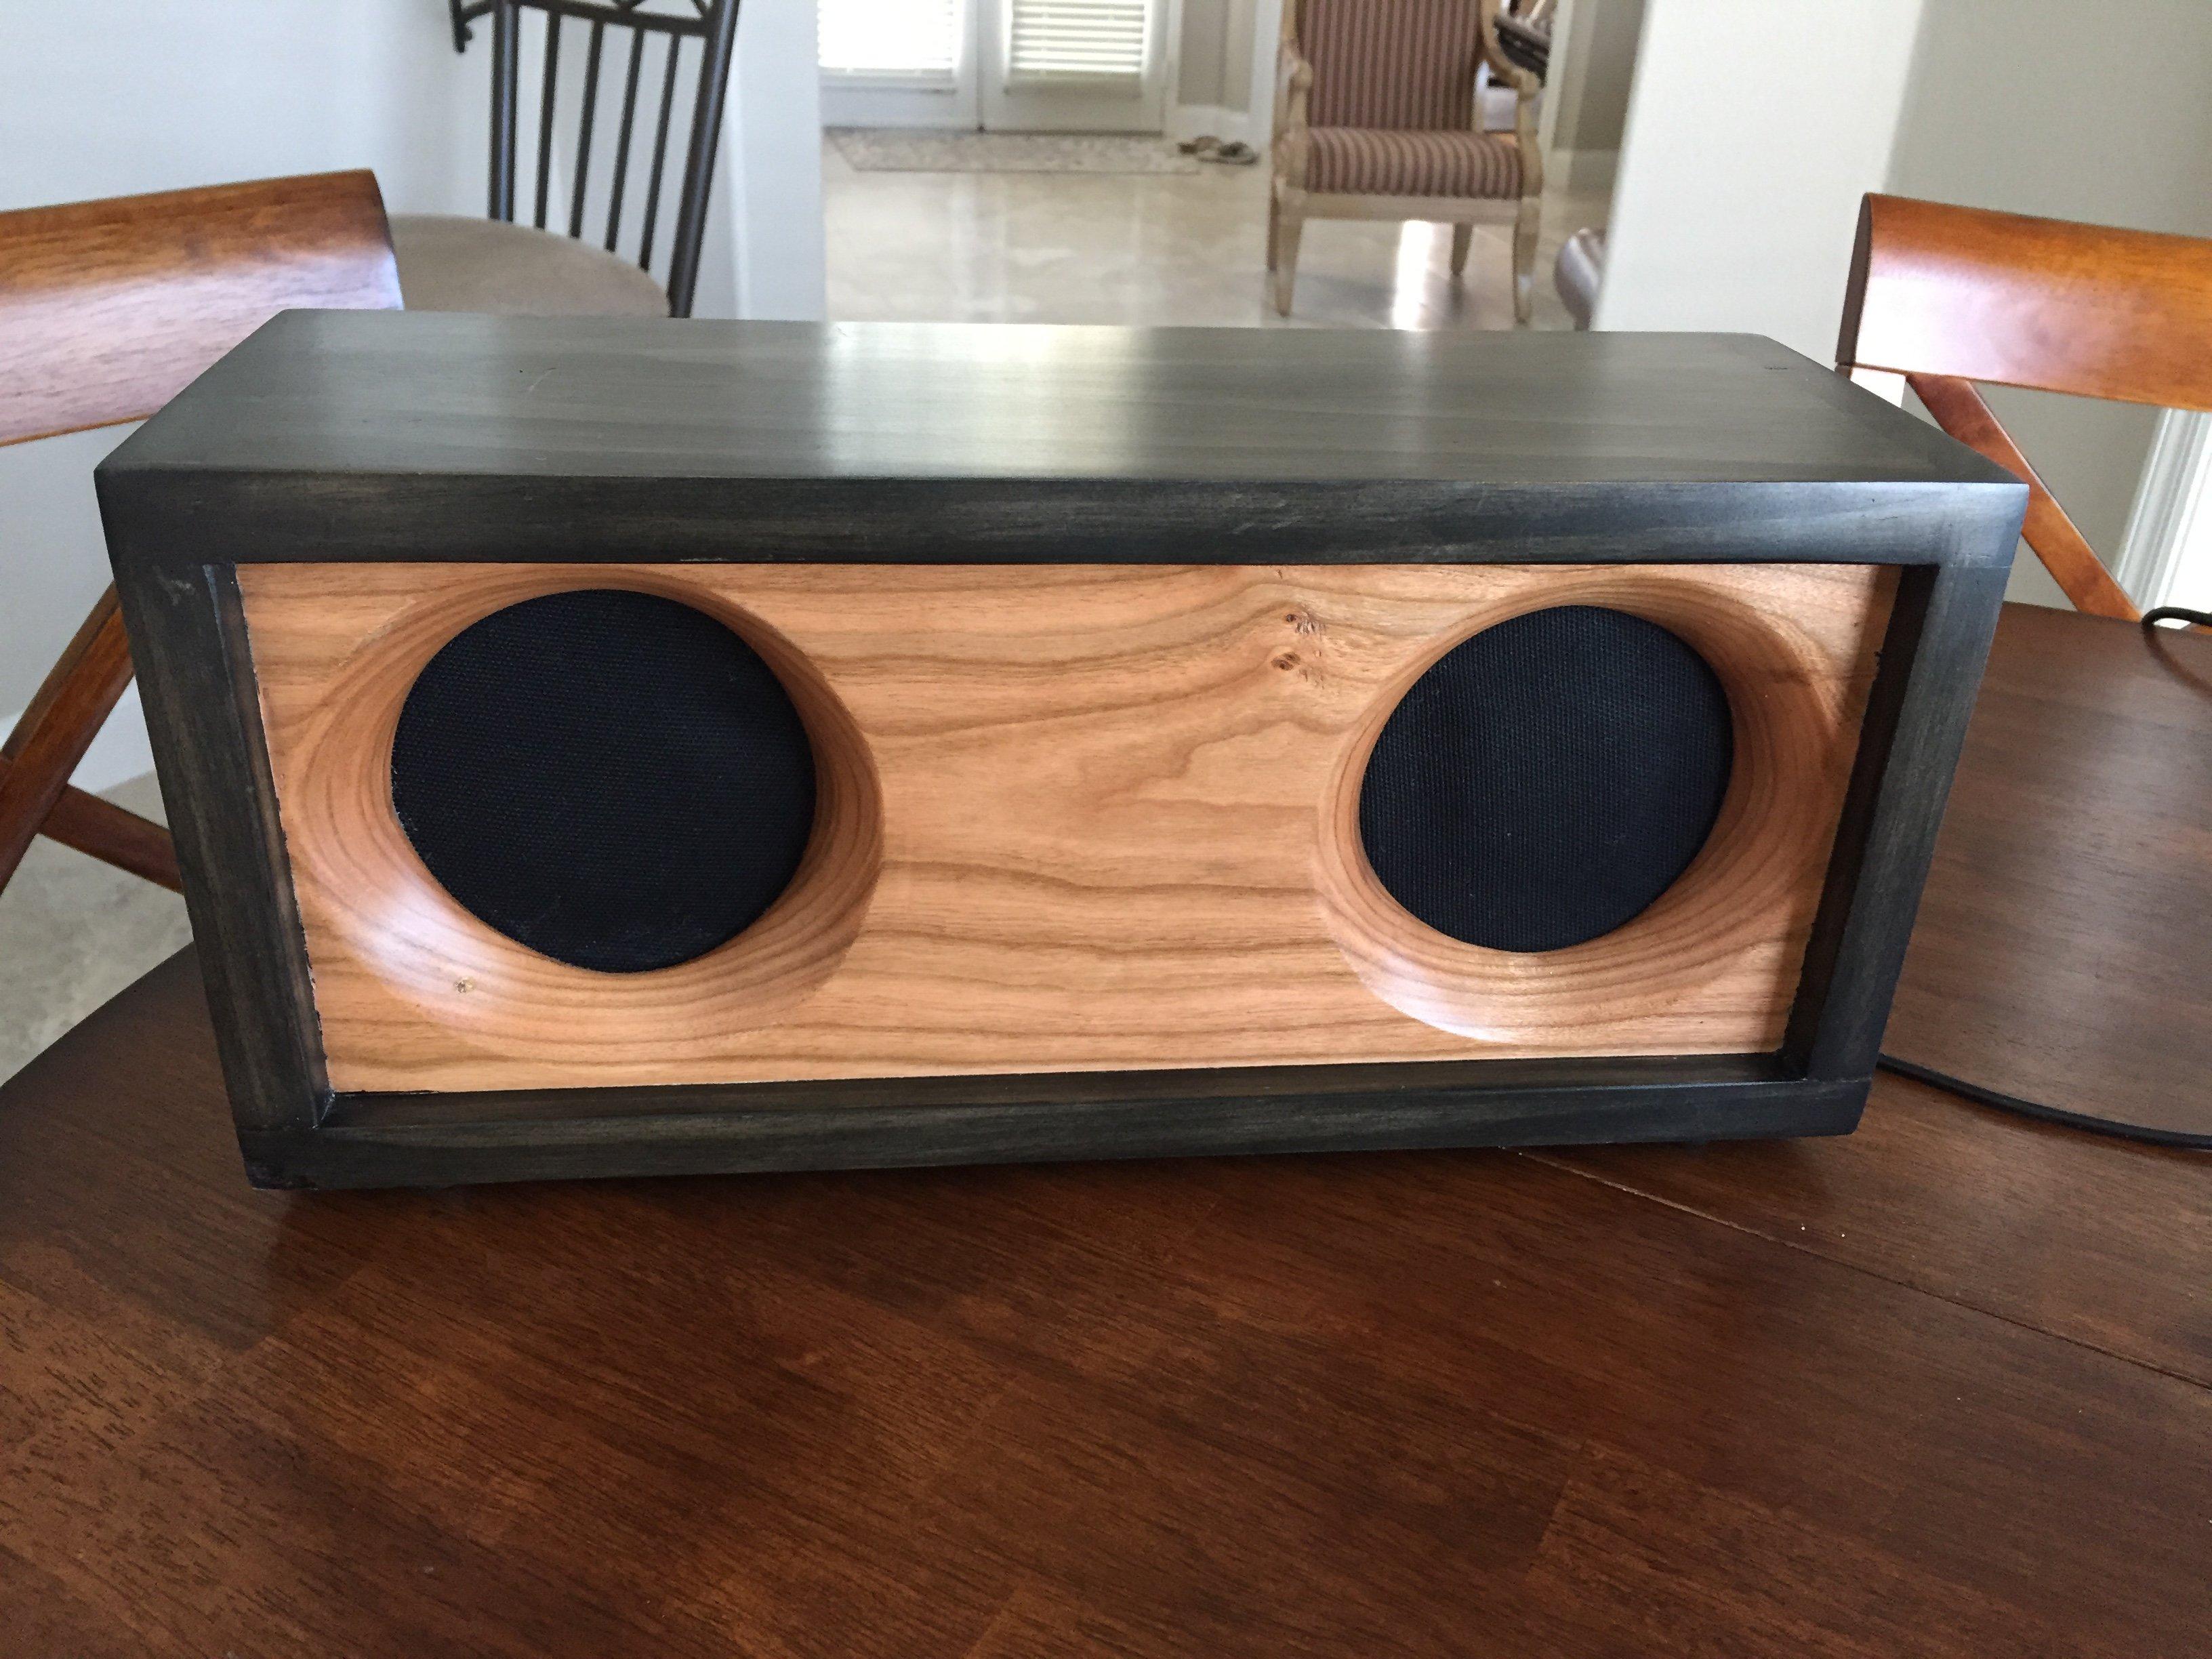 Bluetooth Speaker by wtwegner